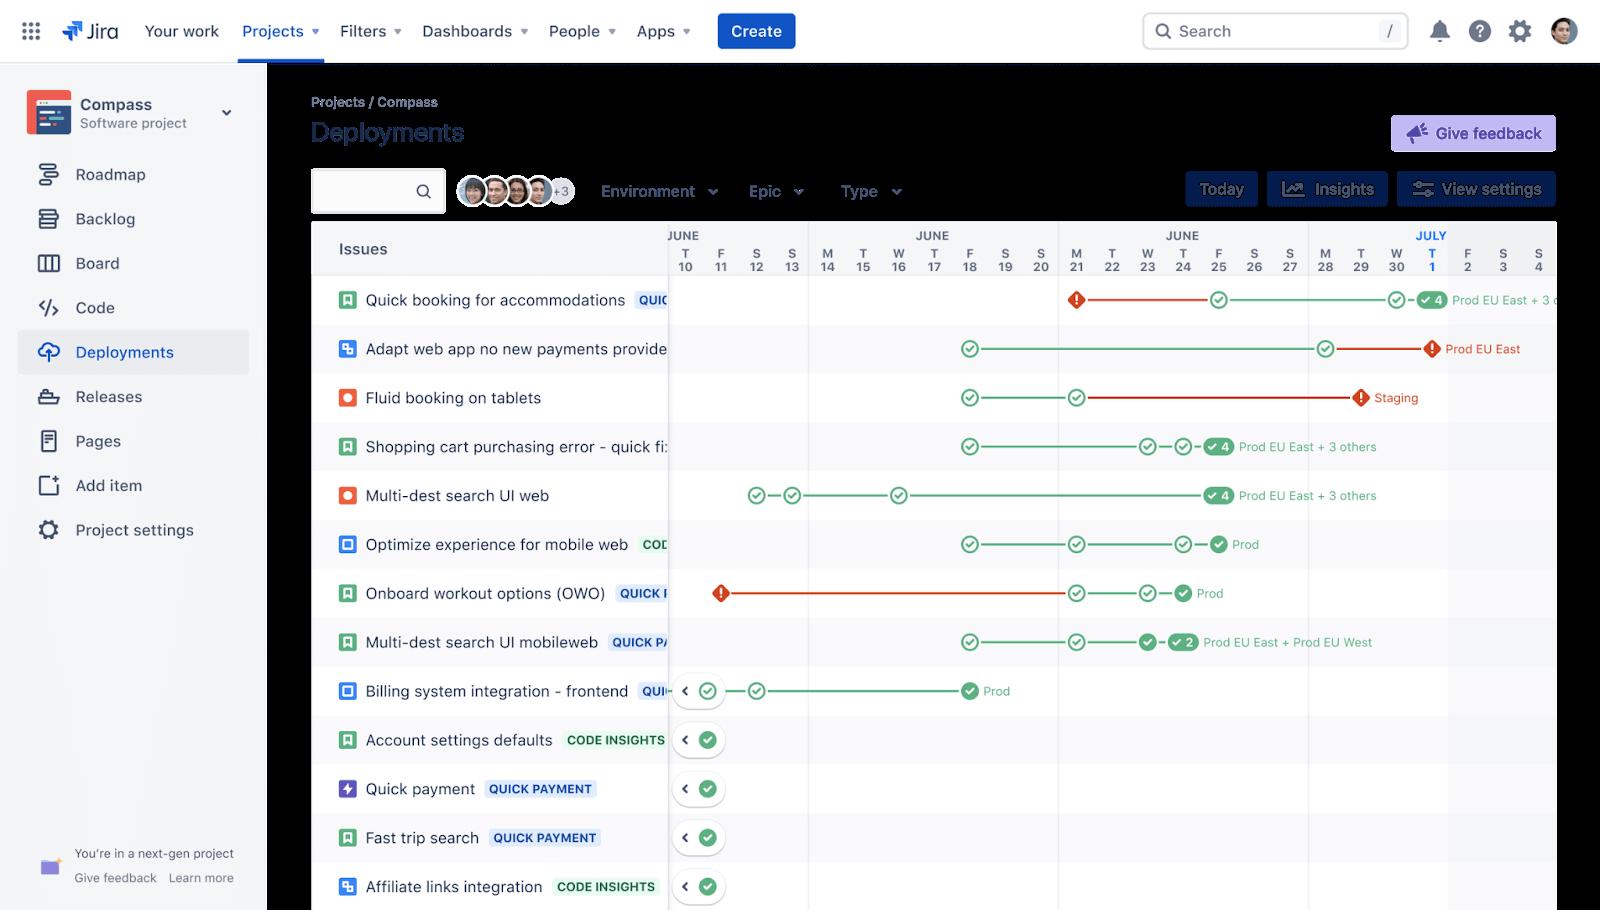 Deployment dashboard view in Jira Software